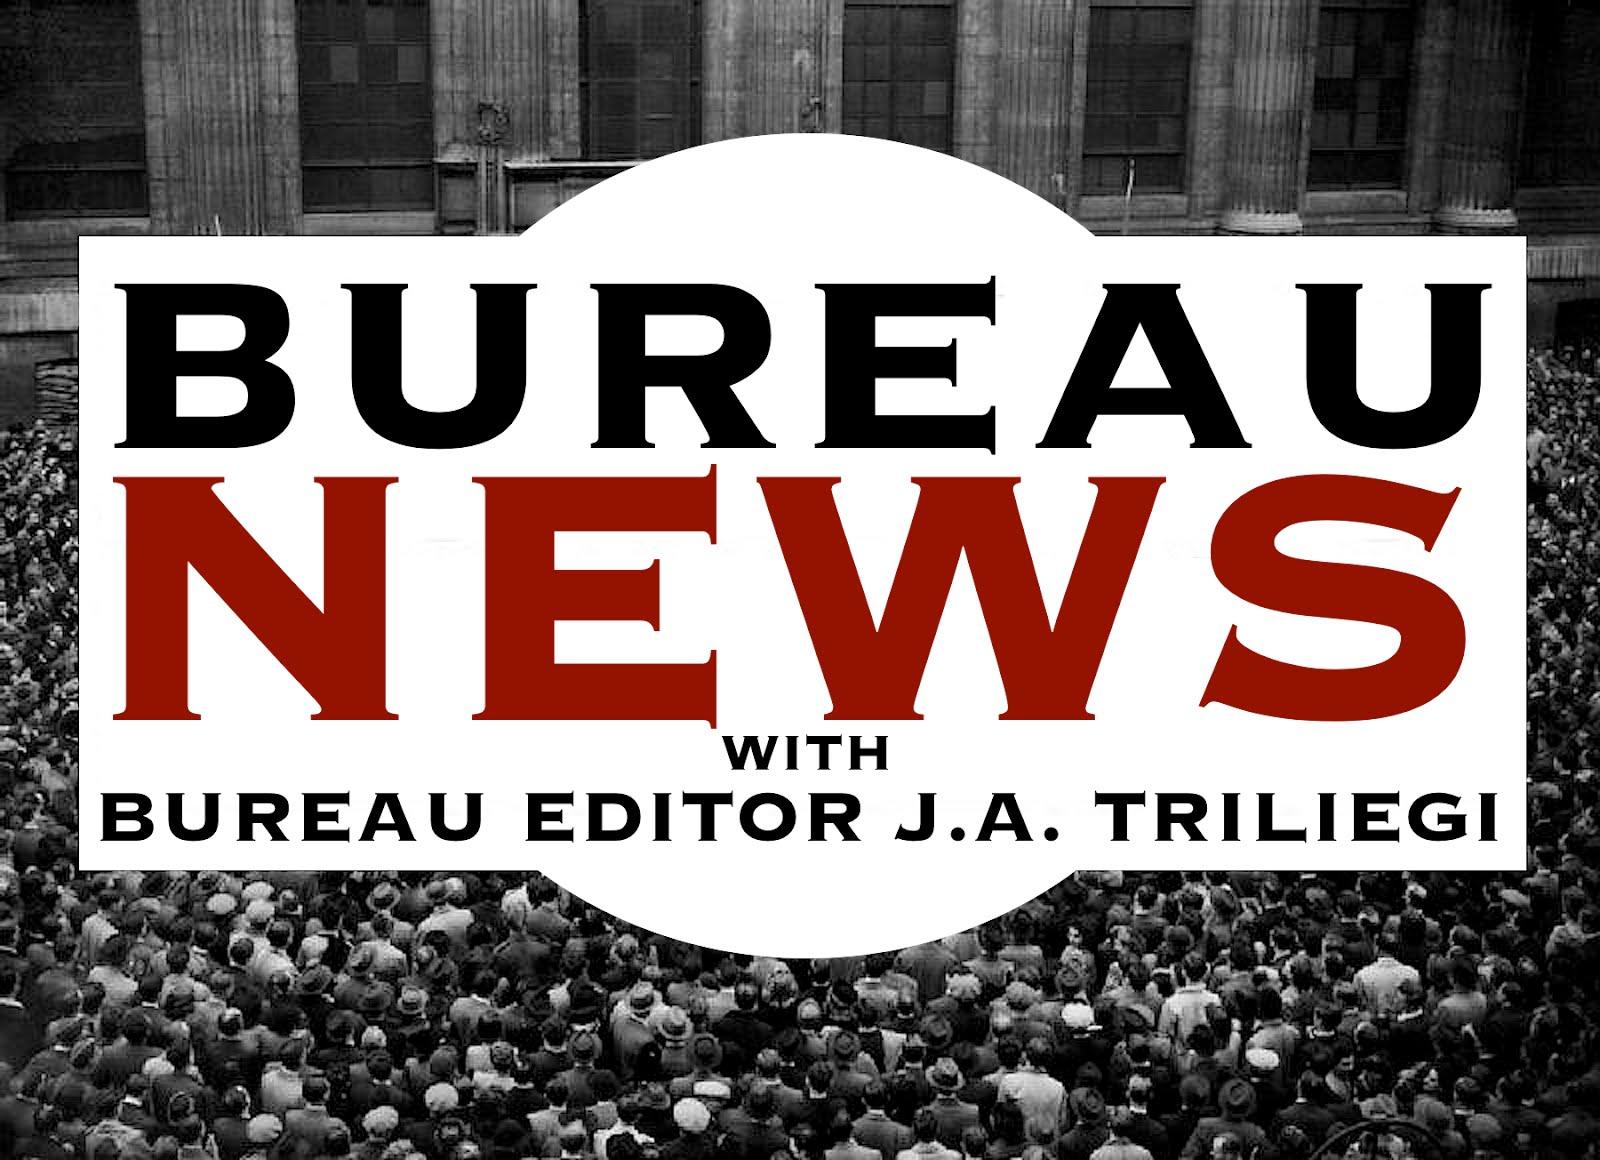 VISIT THE BUREAU NEWS